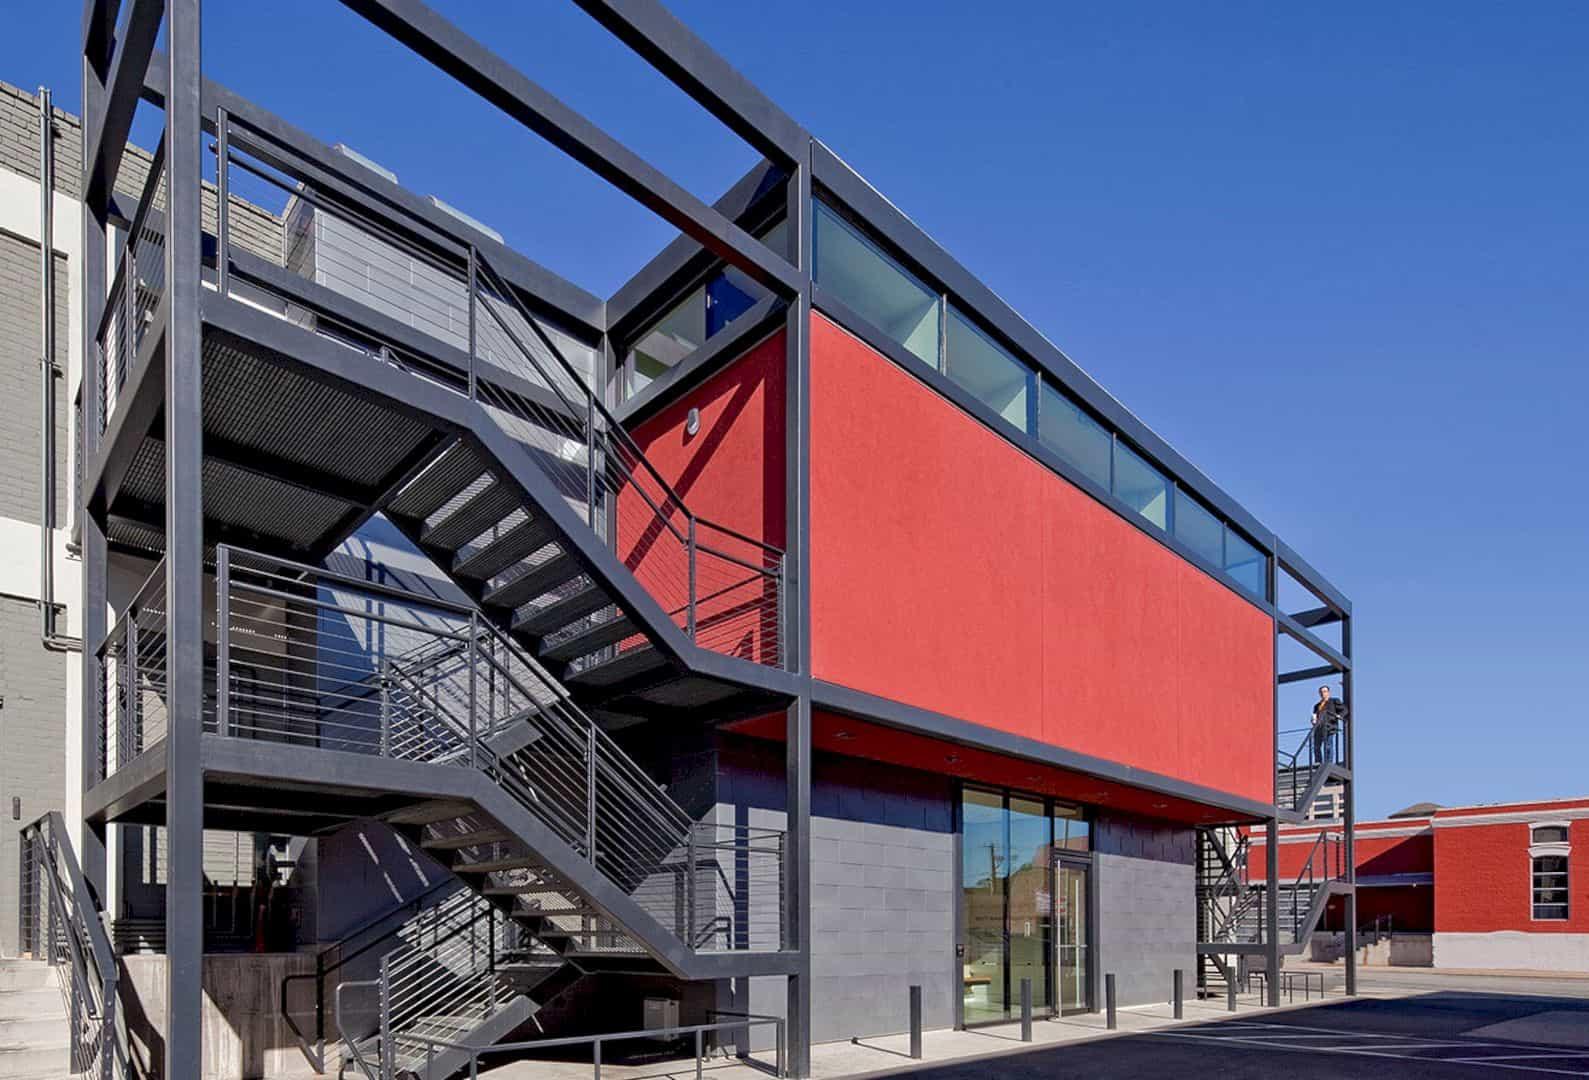 San Jacinto Building By Specht Architects 4